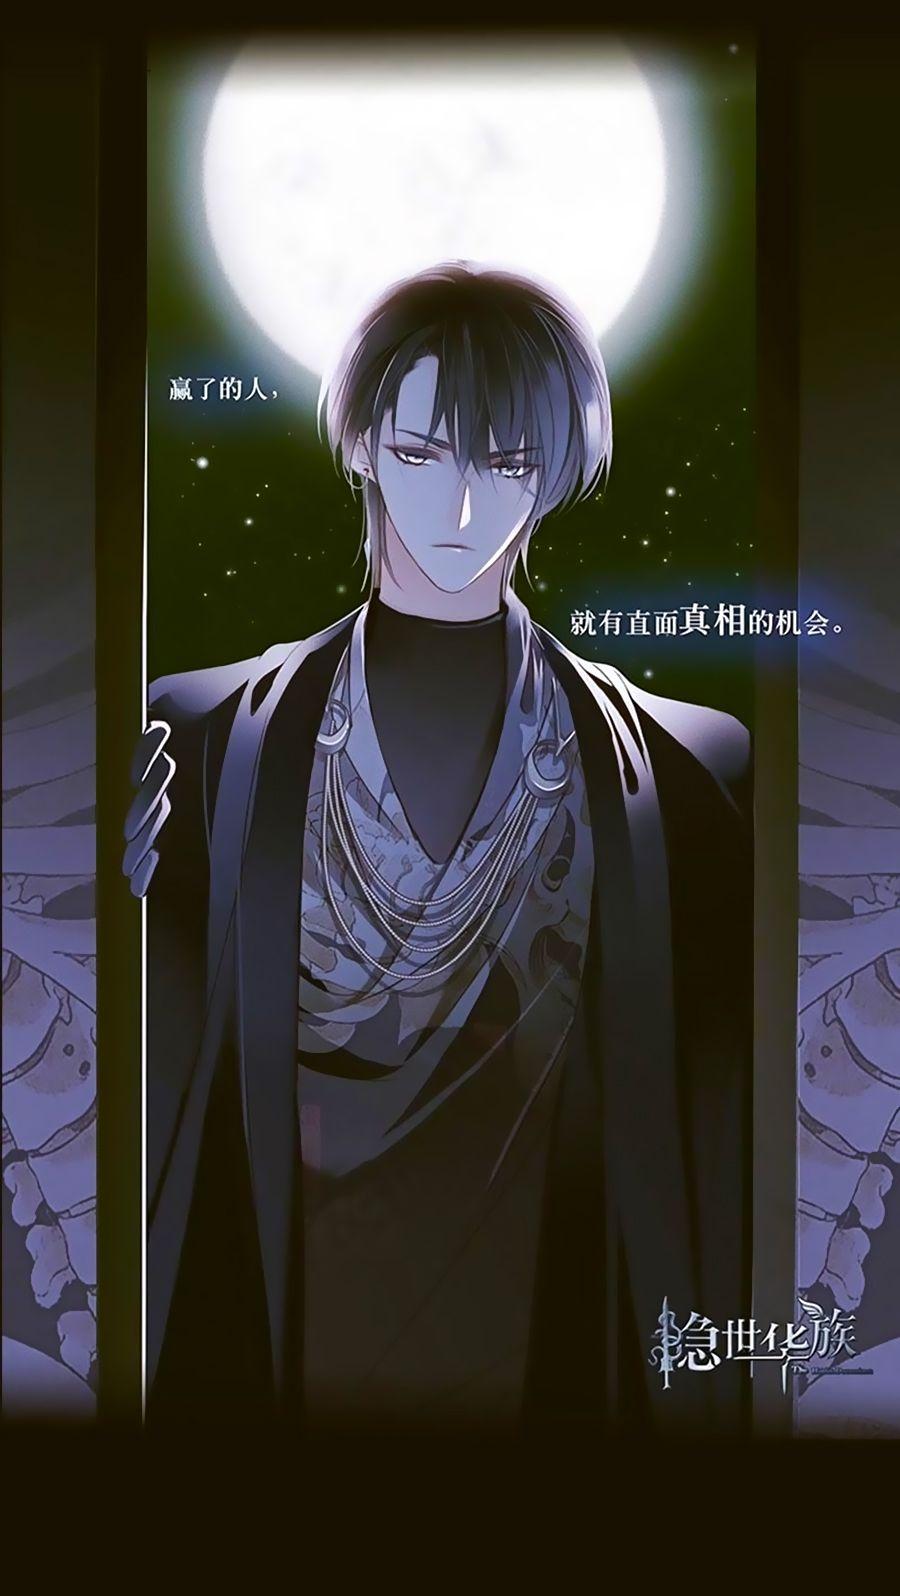 Ẩn Thế Hoa Tộc – Chap 0.1 | A3 Manga